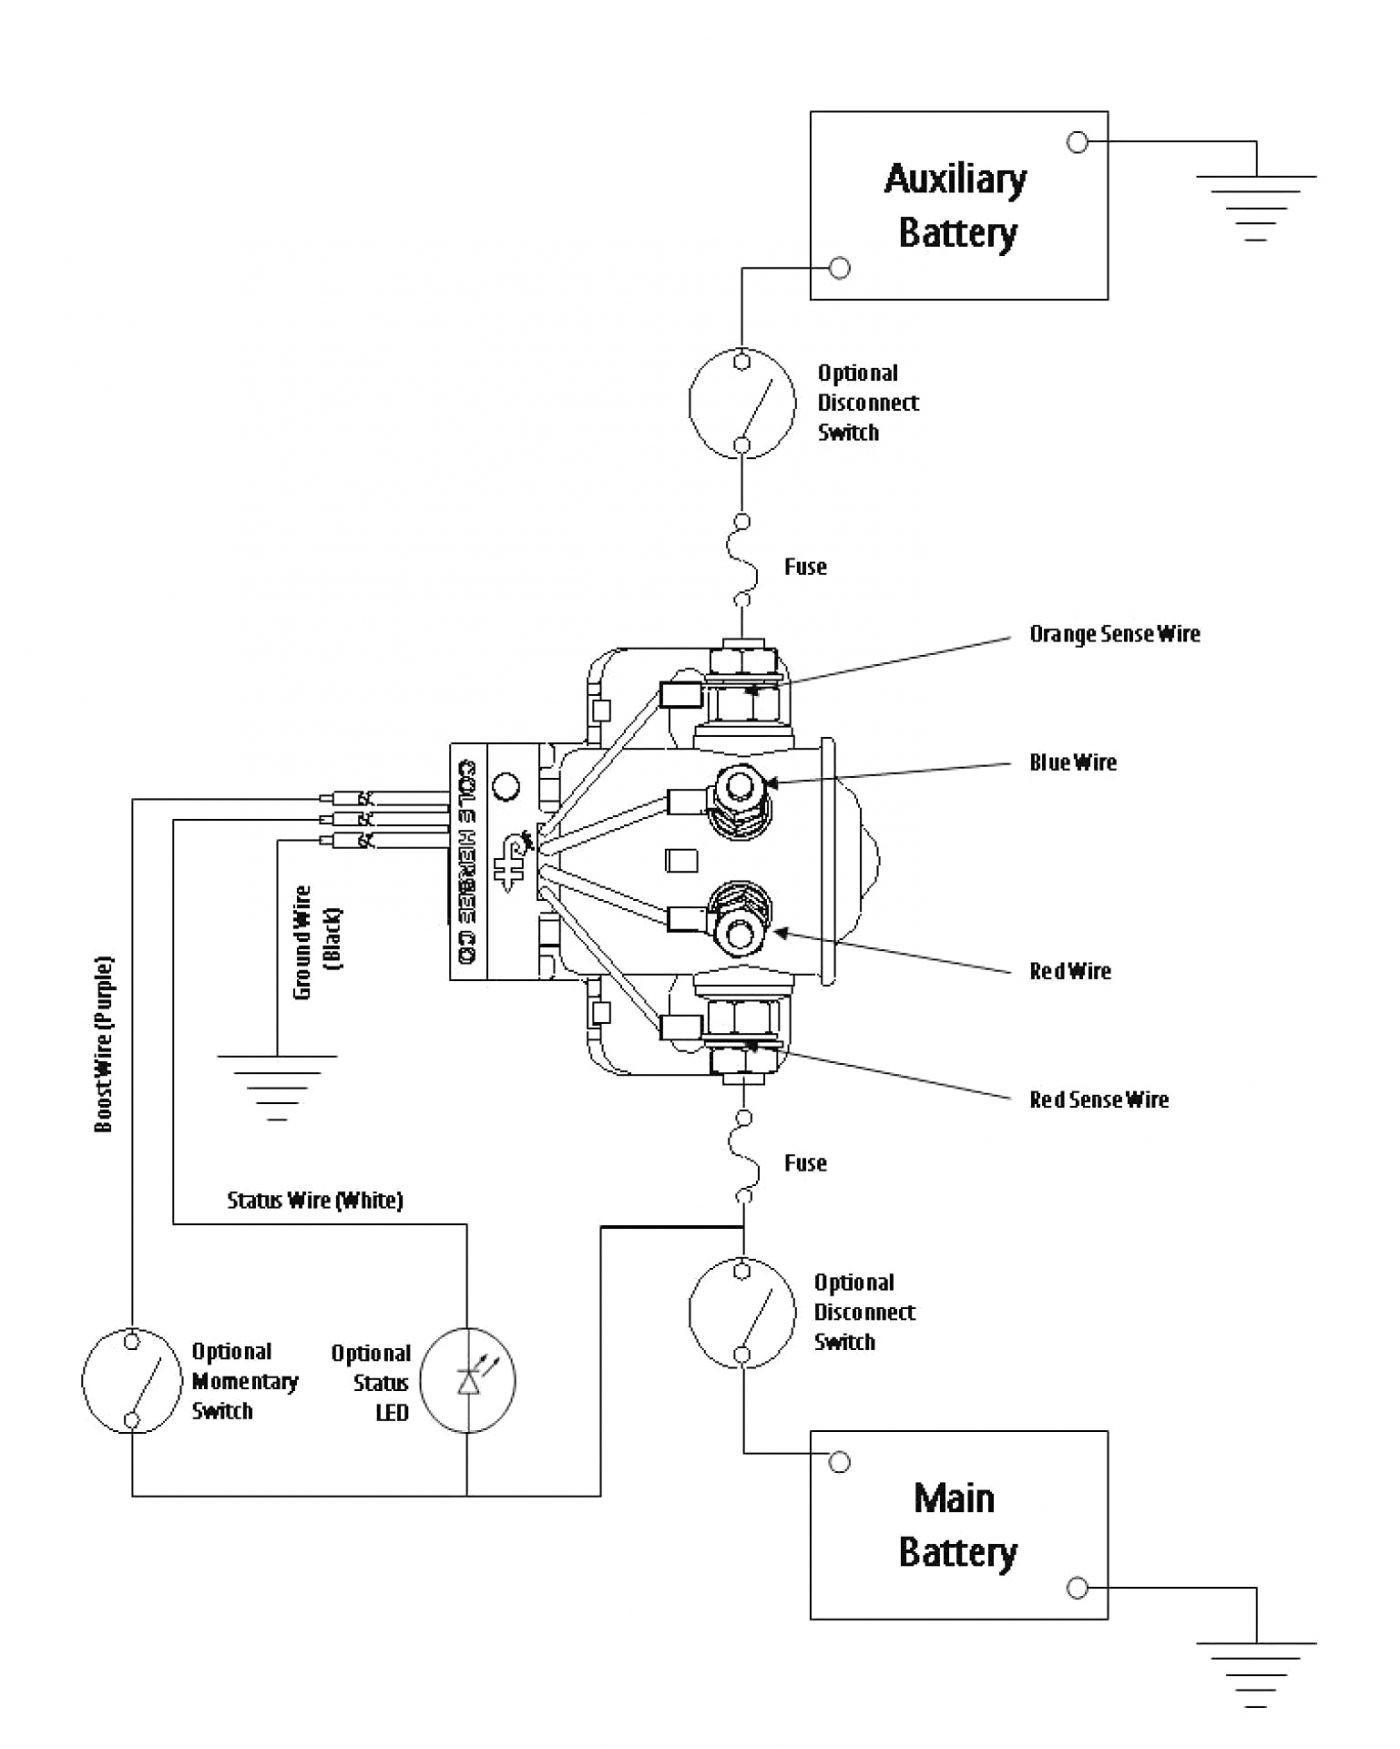 hight resolution of 12v battery isolator wiring diagram awesome wiring diagram image battery solenoid wiring diagram 12v battery disconnect